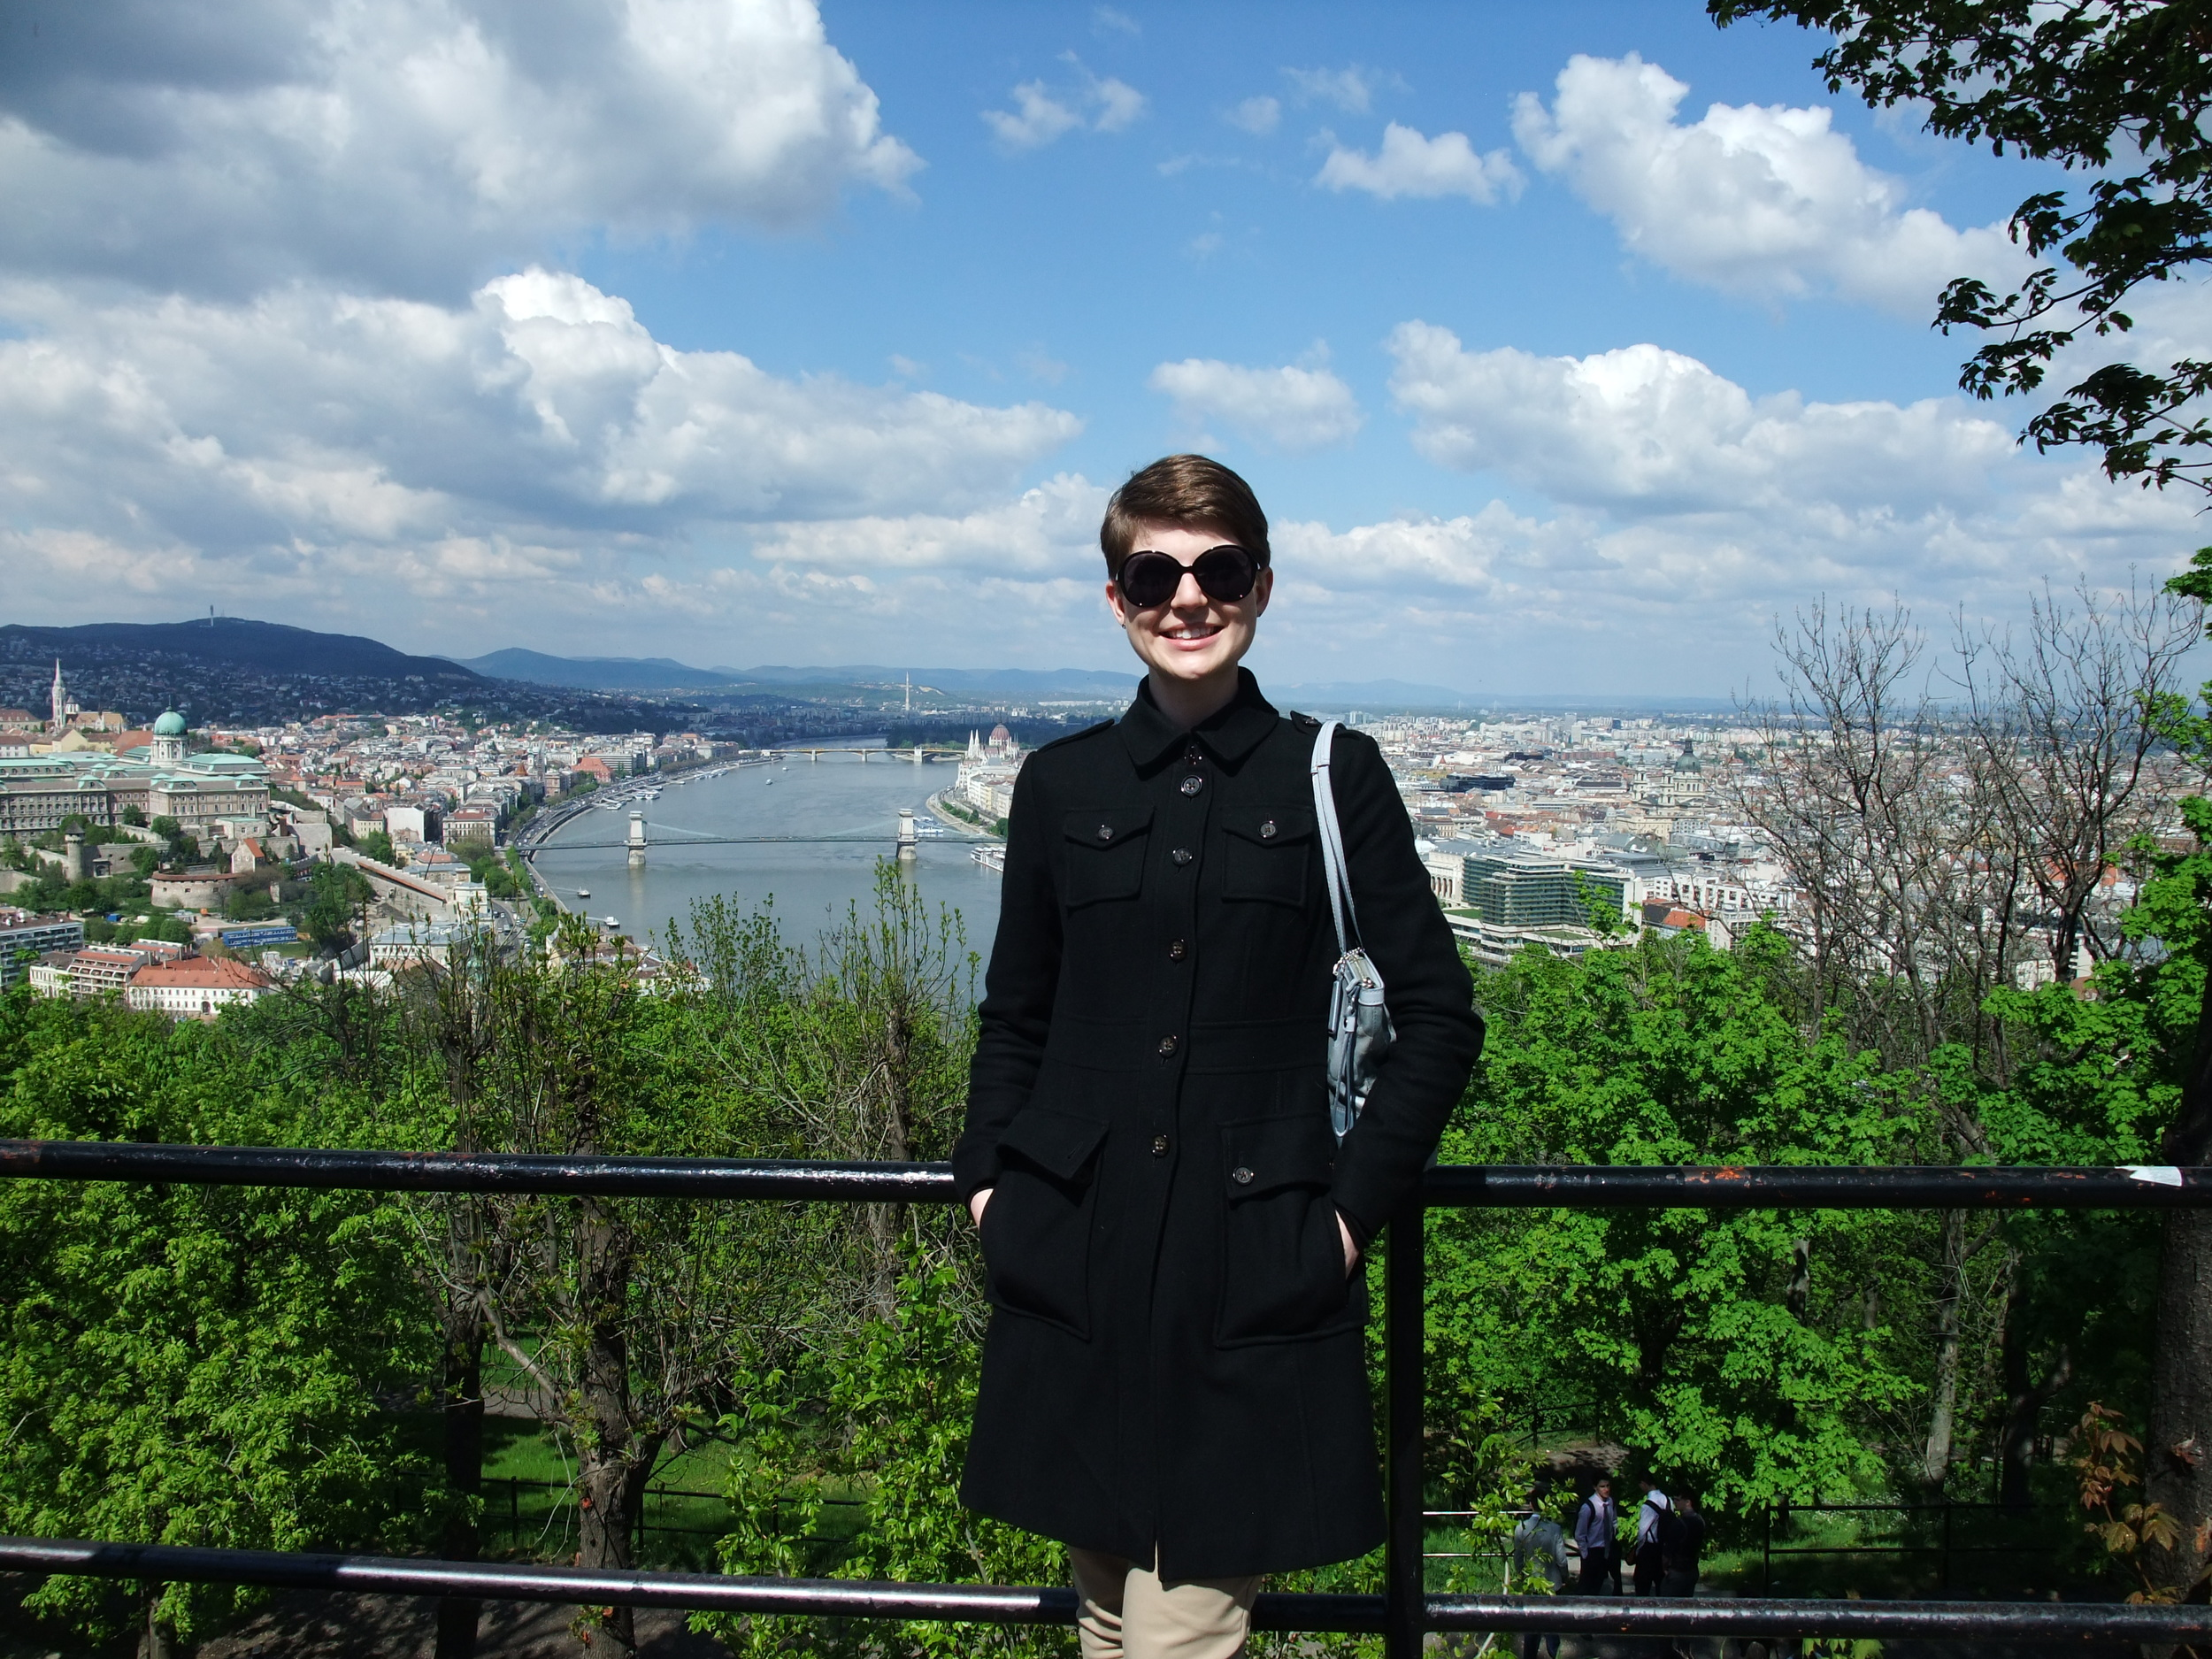 At the top of Gellért Hill